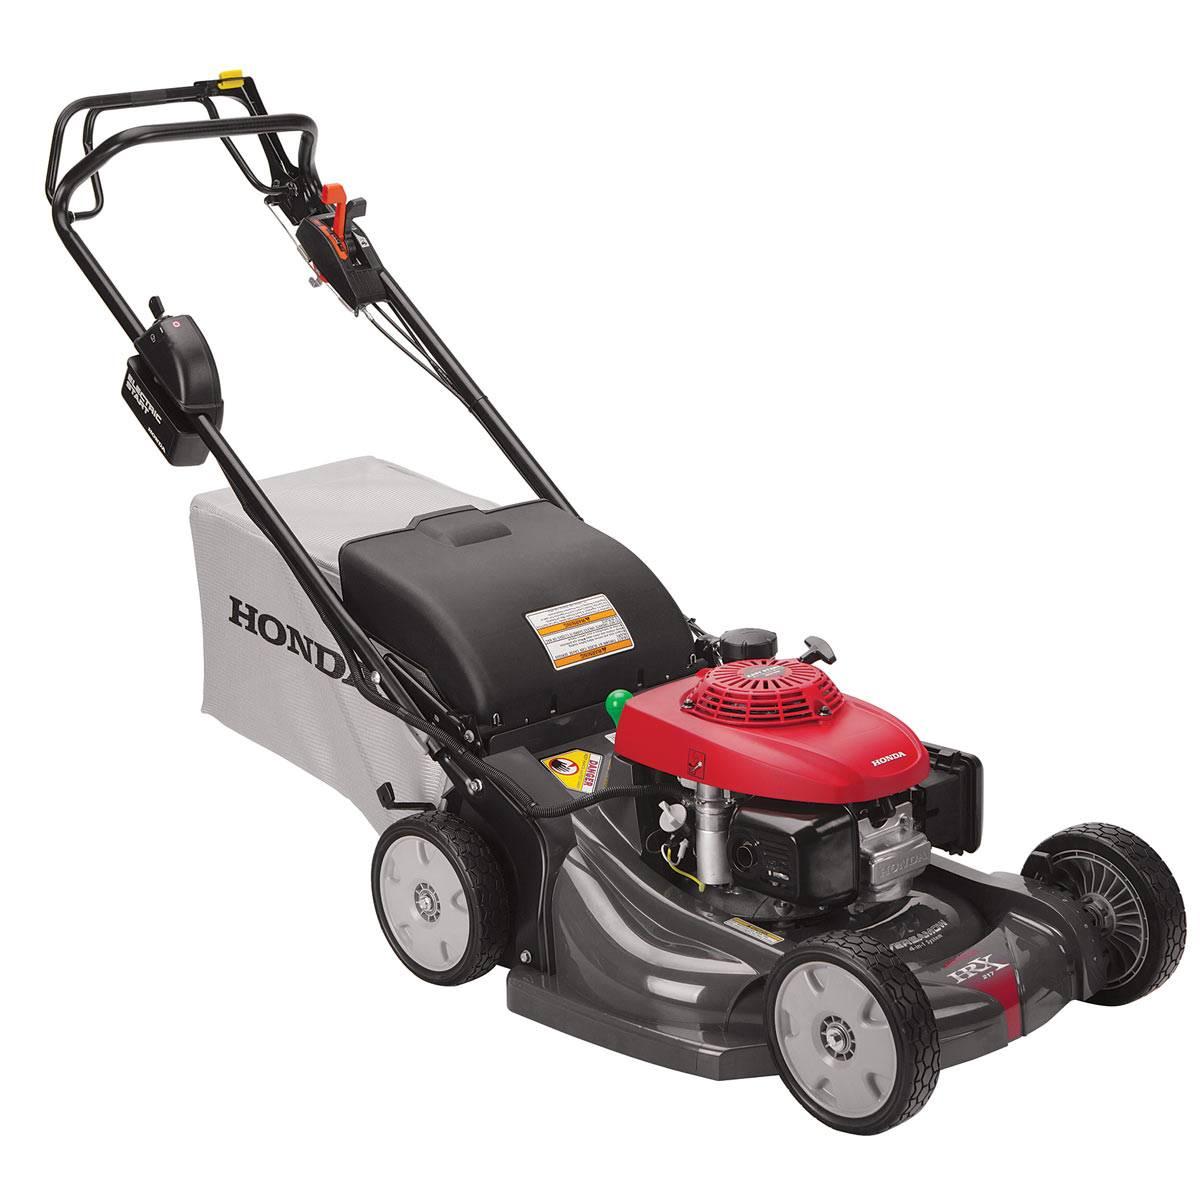 Honda HRX217HZA Self-propelled Lawn Mower